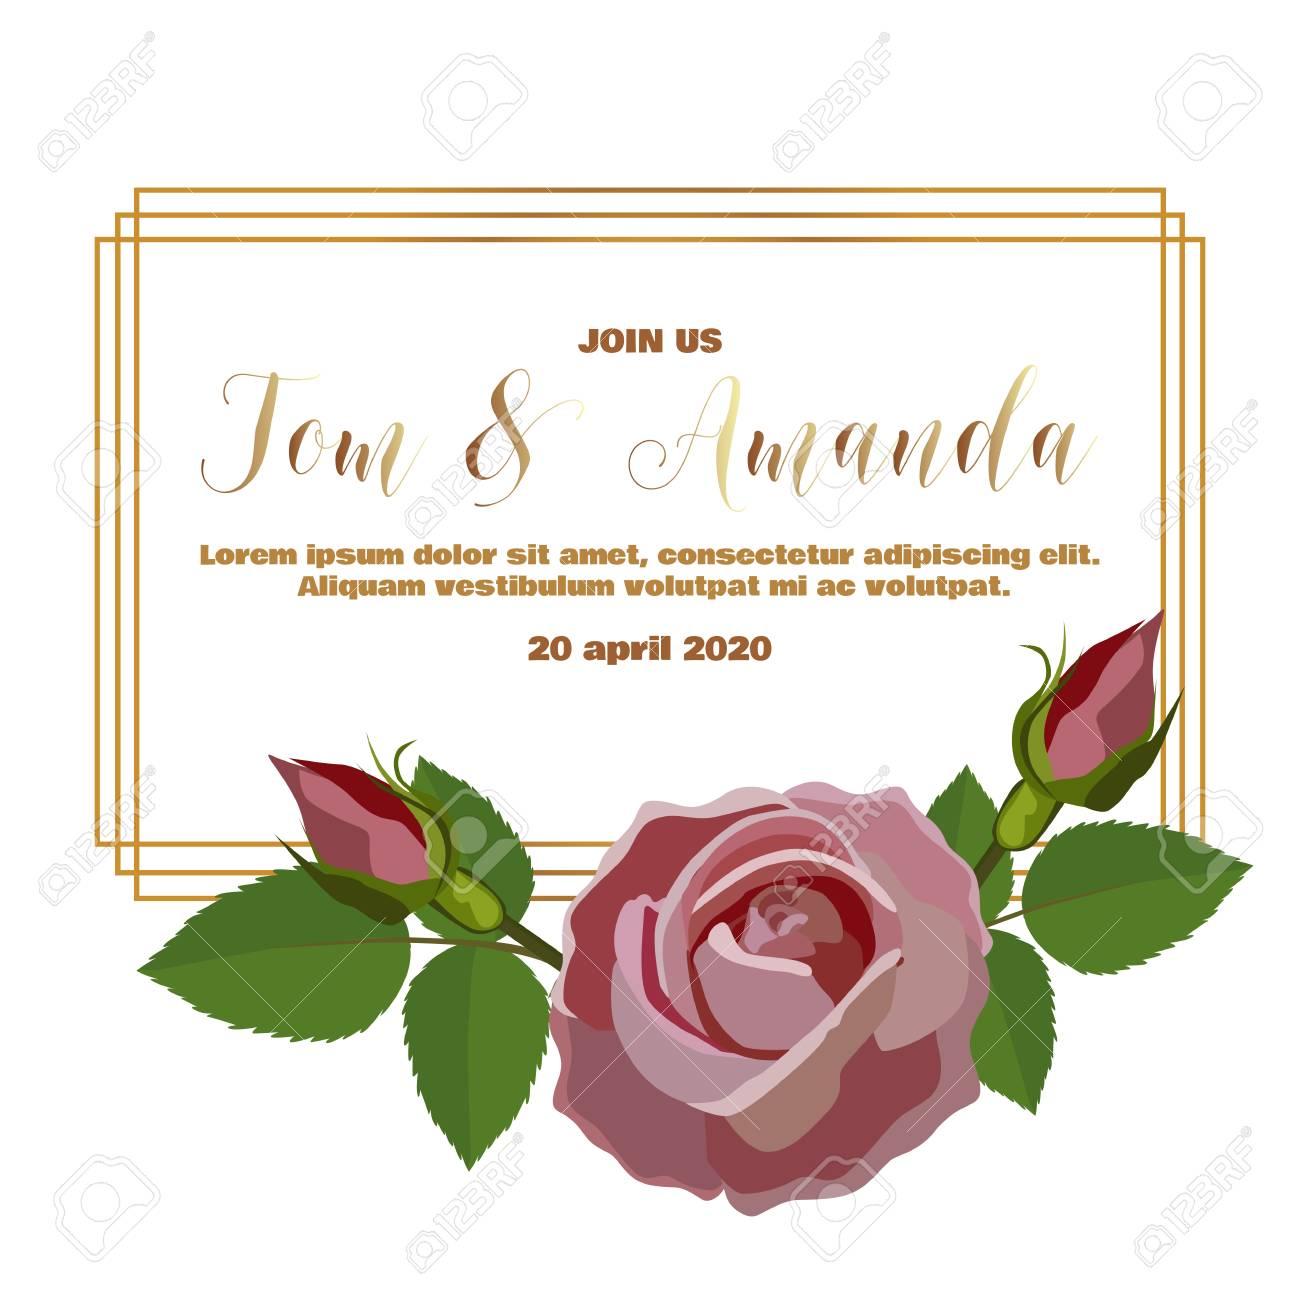 003 Dreaded Printable Wedding Invitation Template Design  Free For Microsoft Word VintageFull